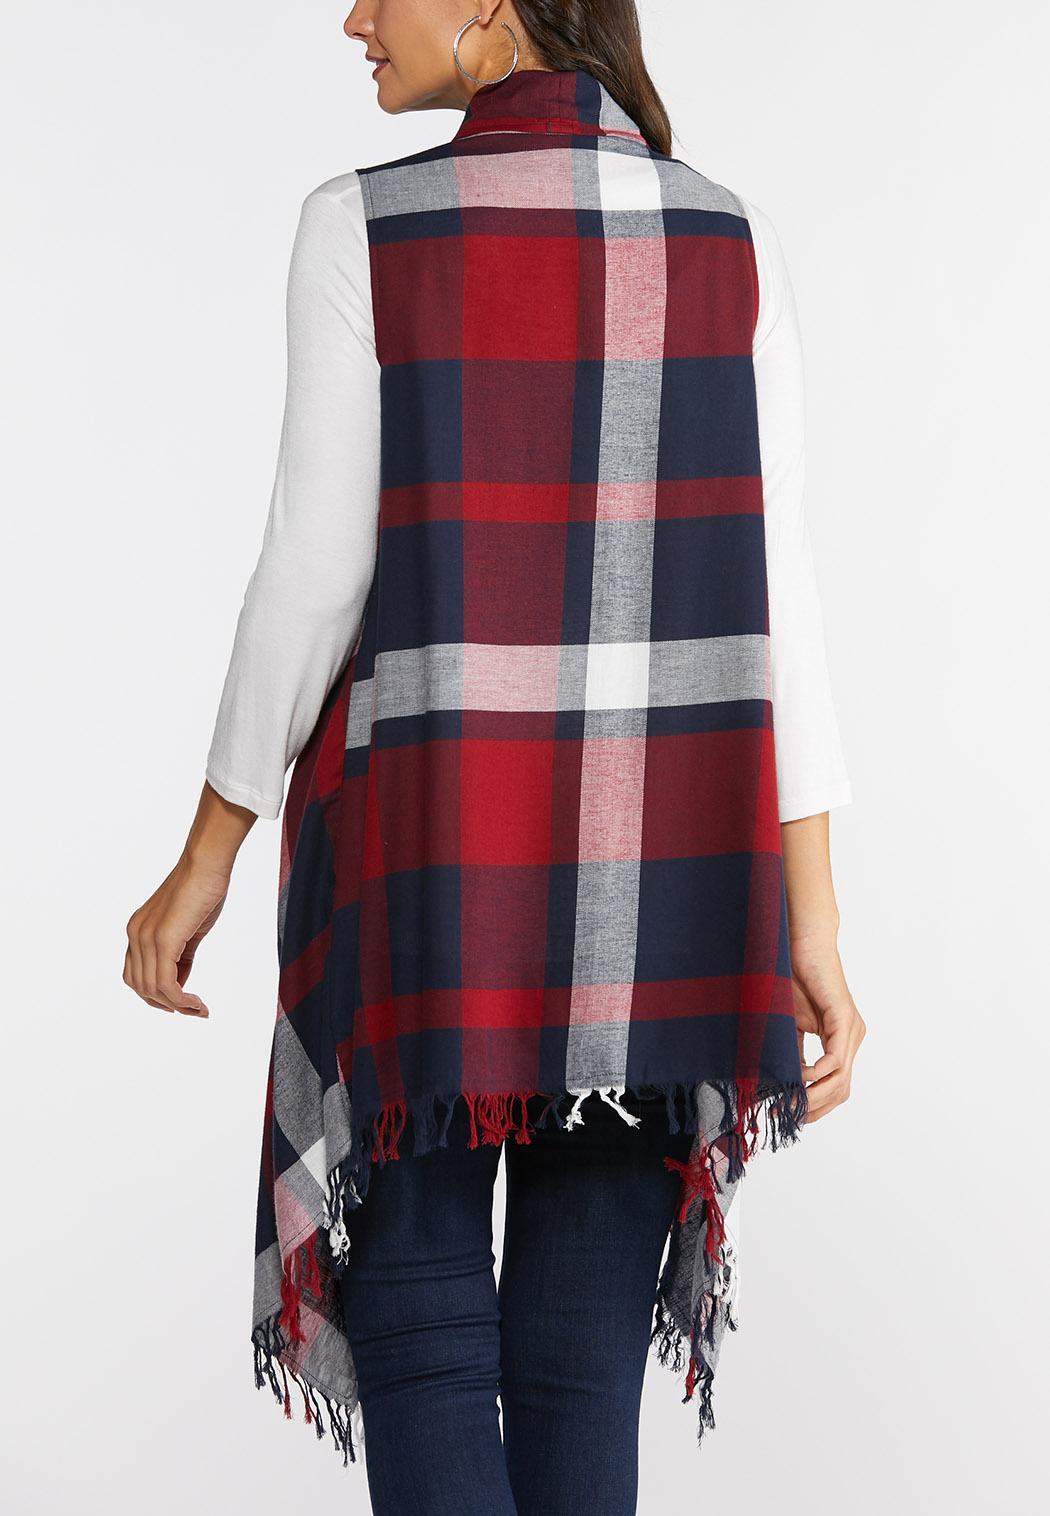 Plus Size Fringe Plaid Vest (Item #43928736)